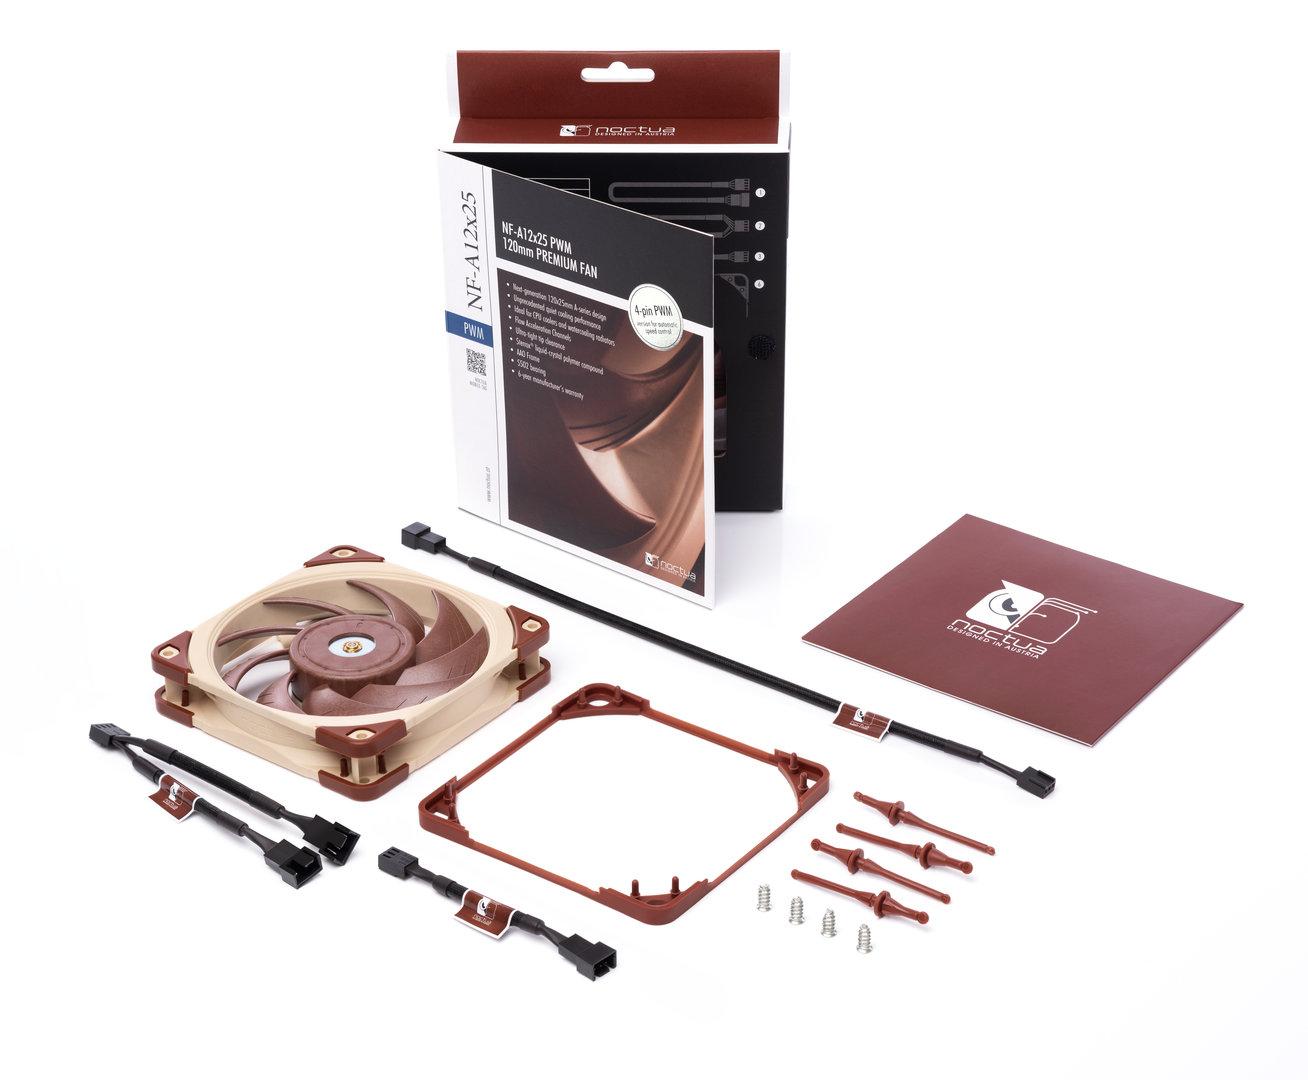 Noctua NF-A12x25: Neuer Premium-Lüfter von Noctua